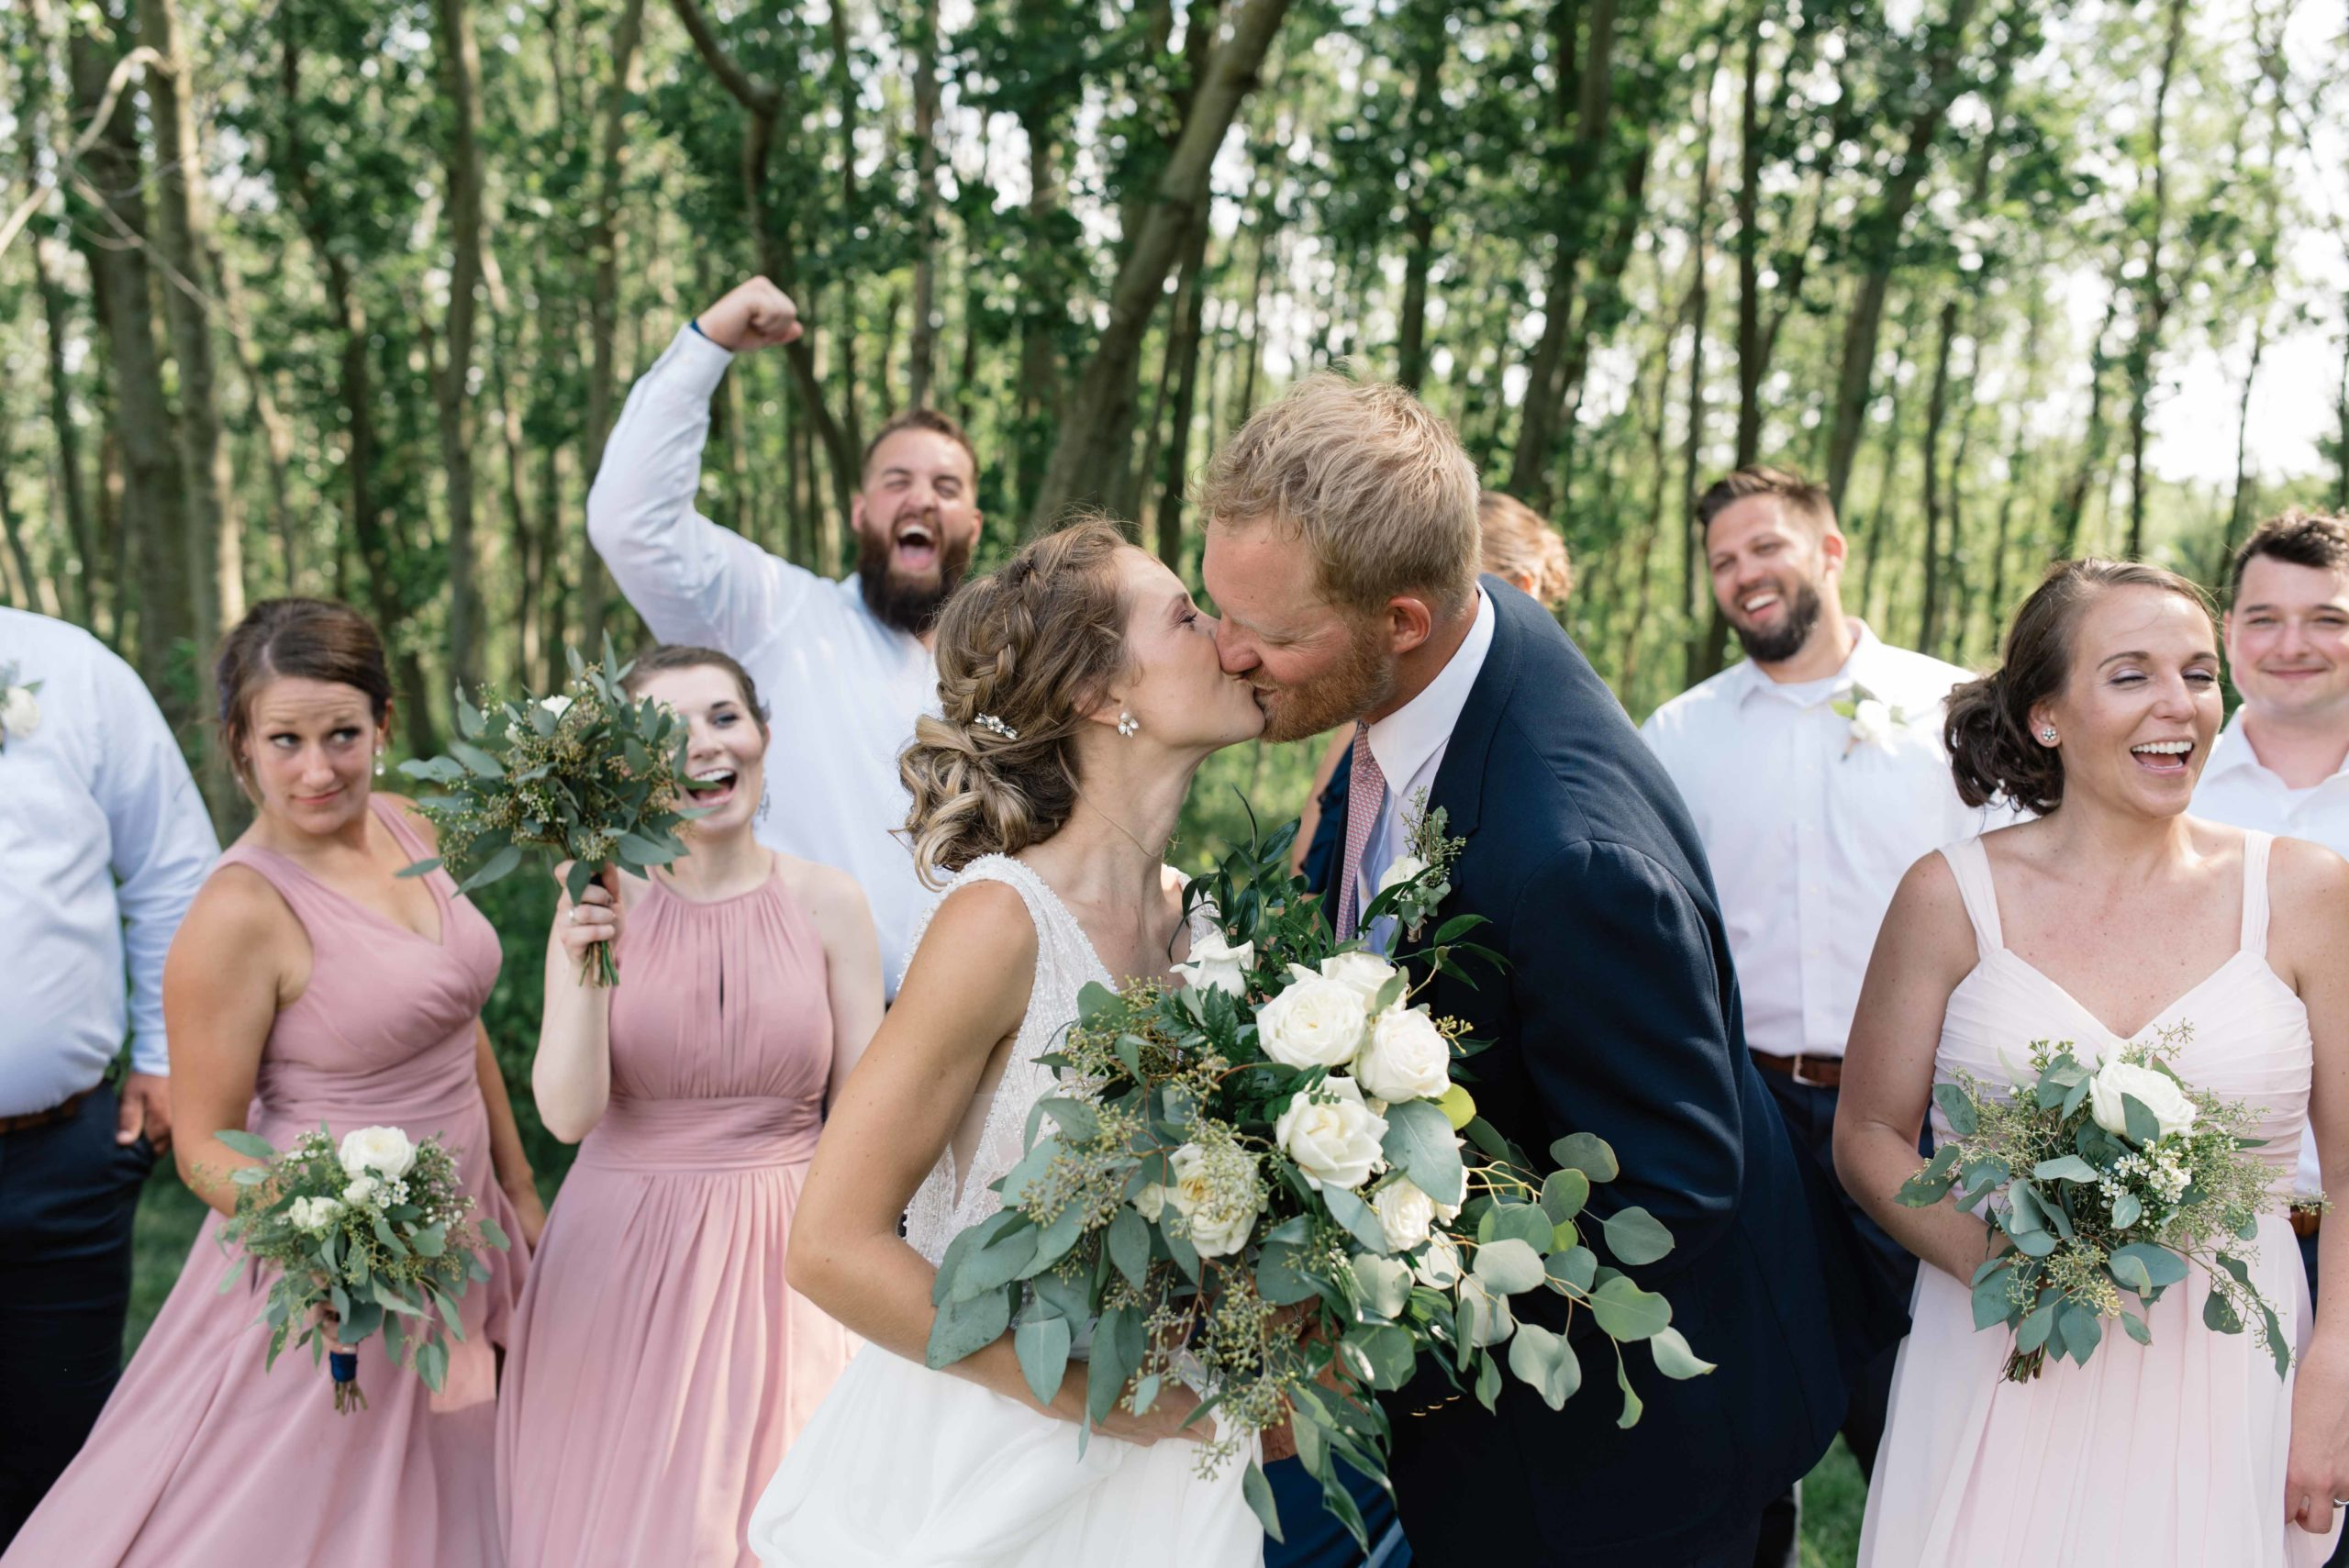 bridal party cheering as bride and groom kiss schafer century barn iowa wedding venue